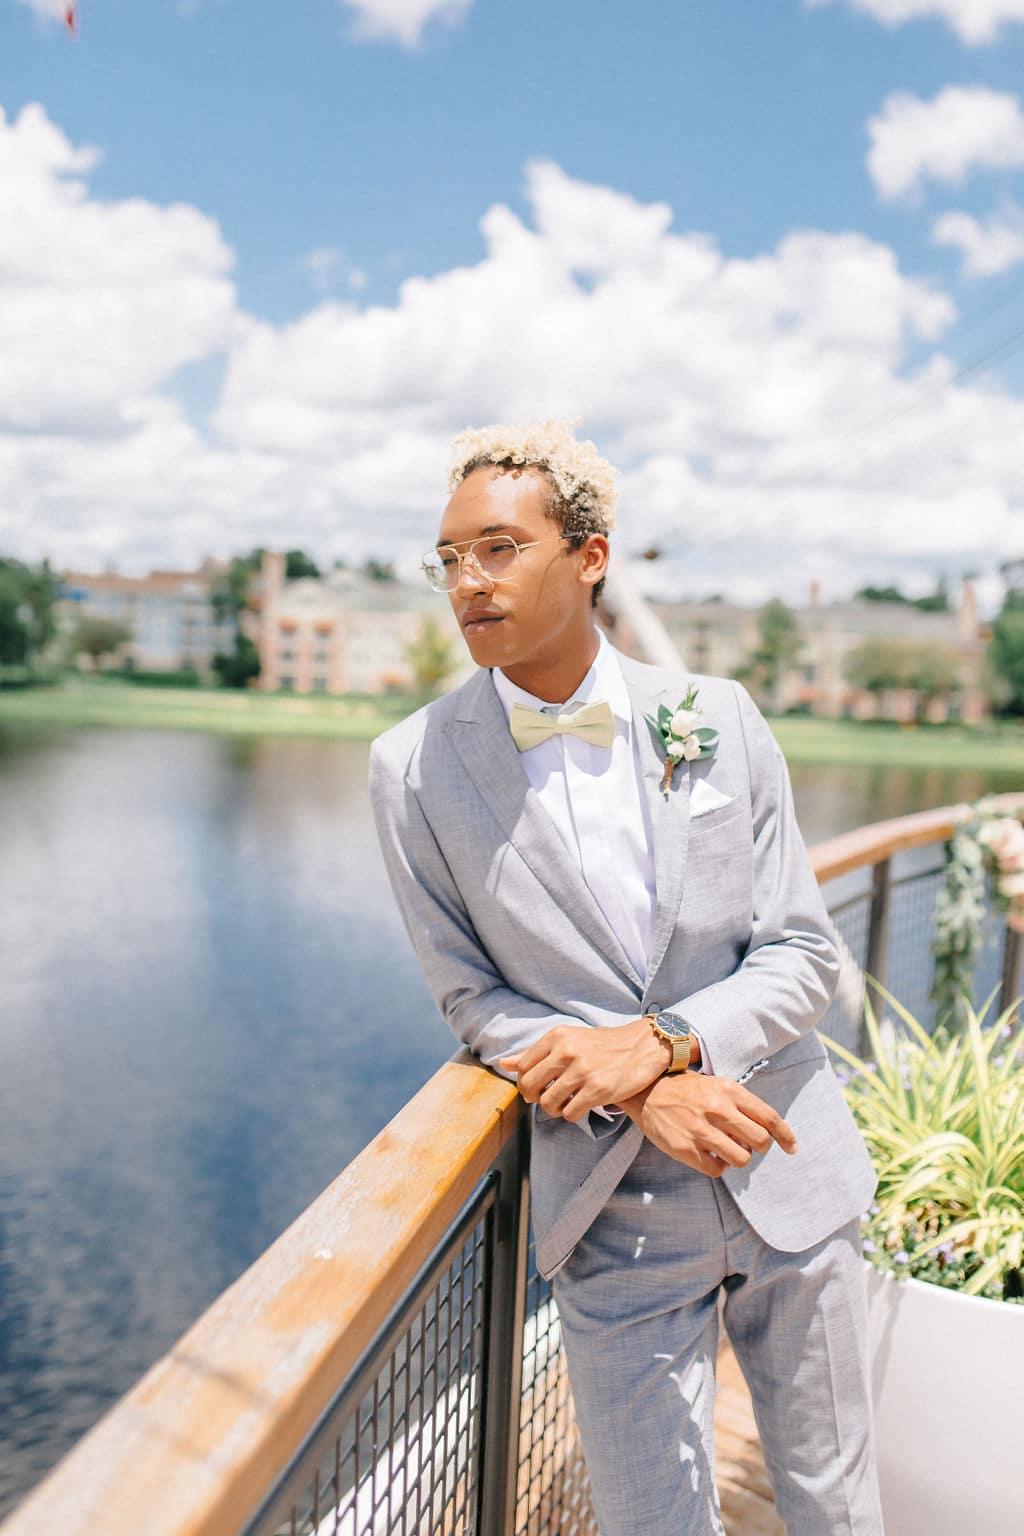 micro wedding Disney Princess and the Frog Wedding Theme groom attire